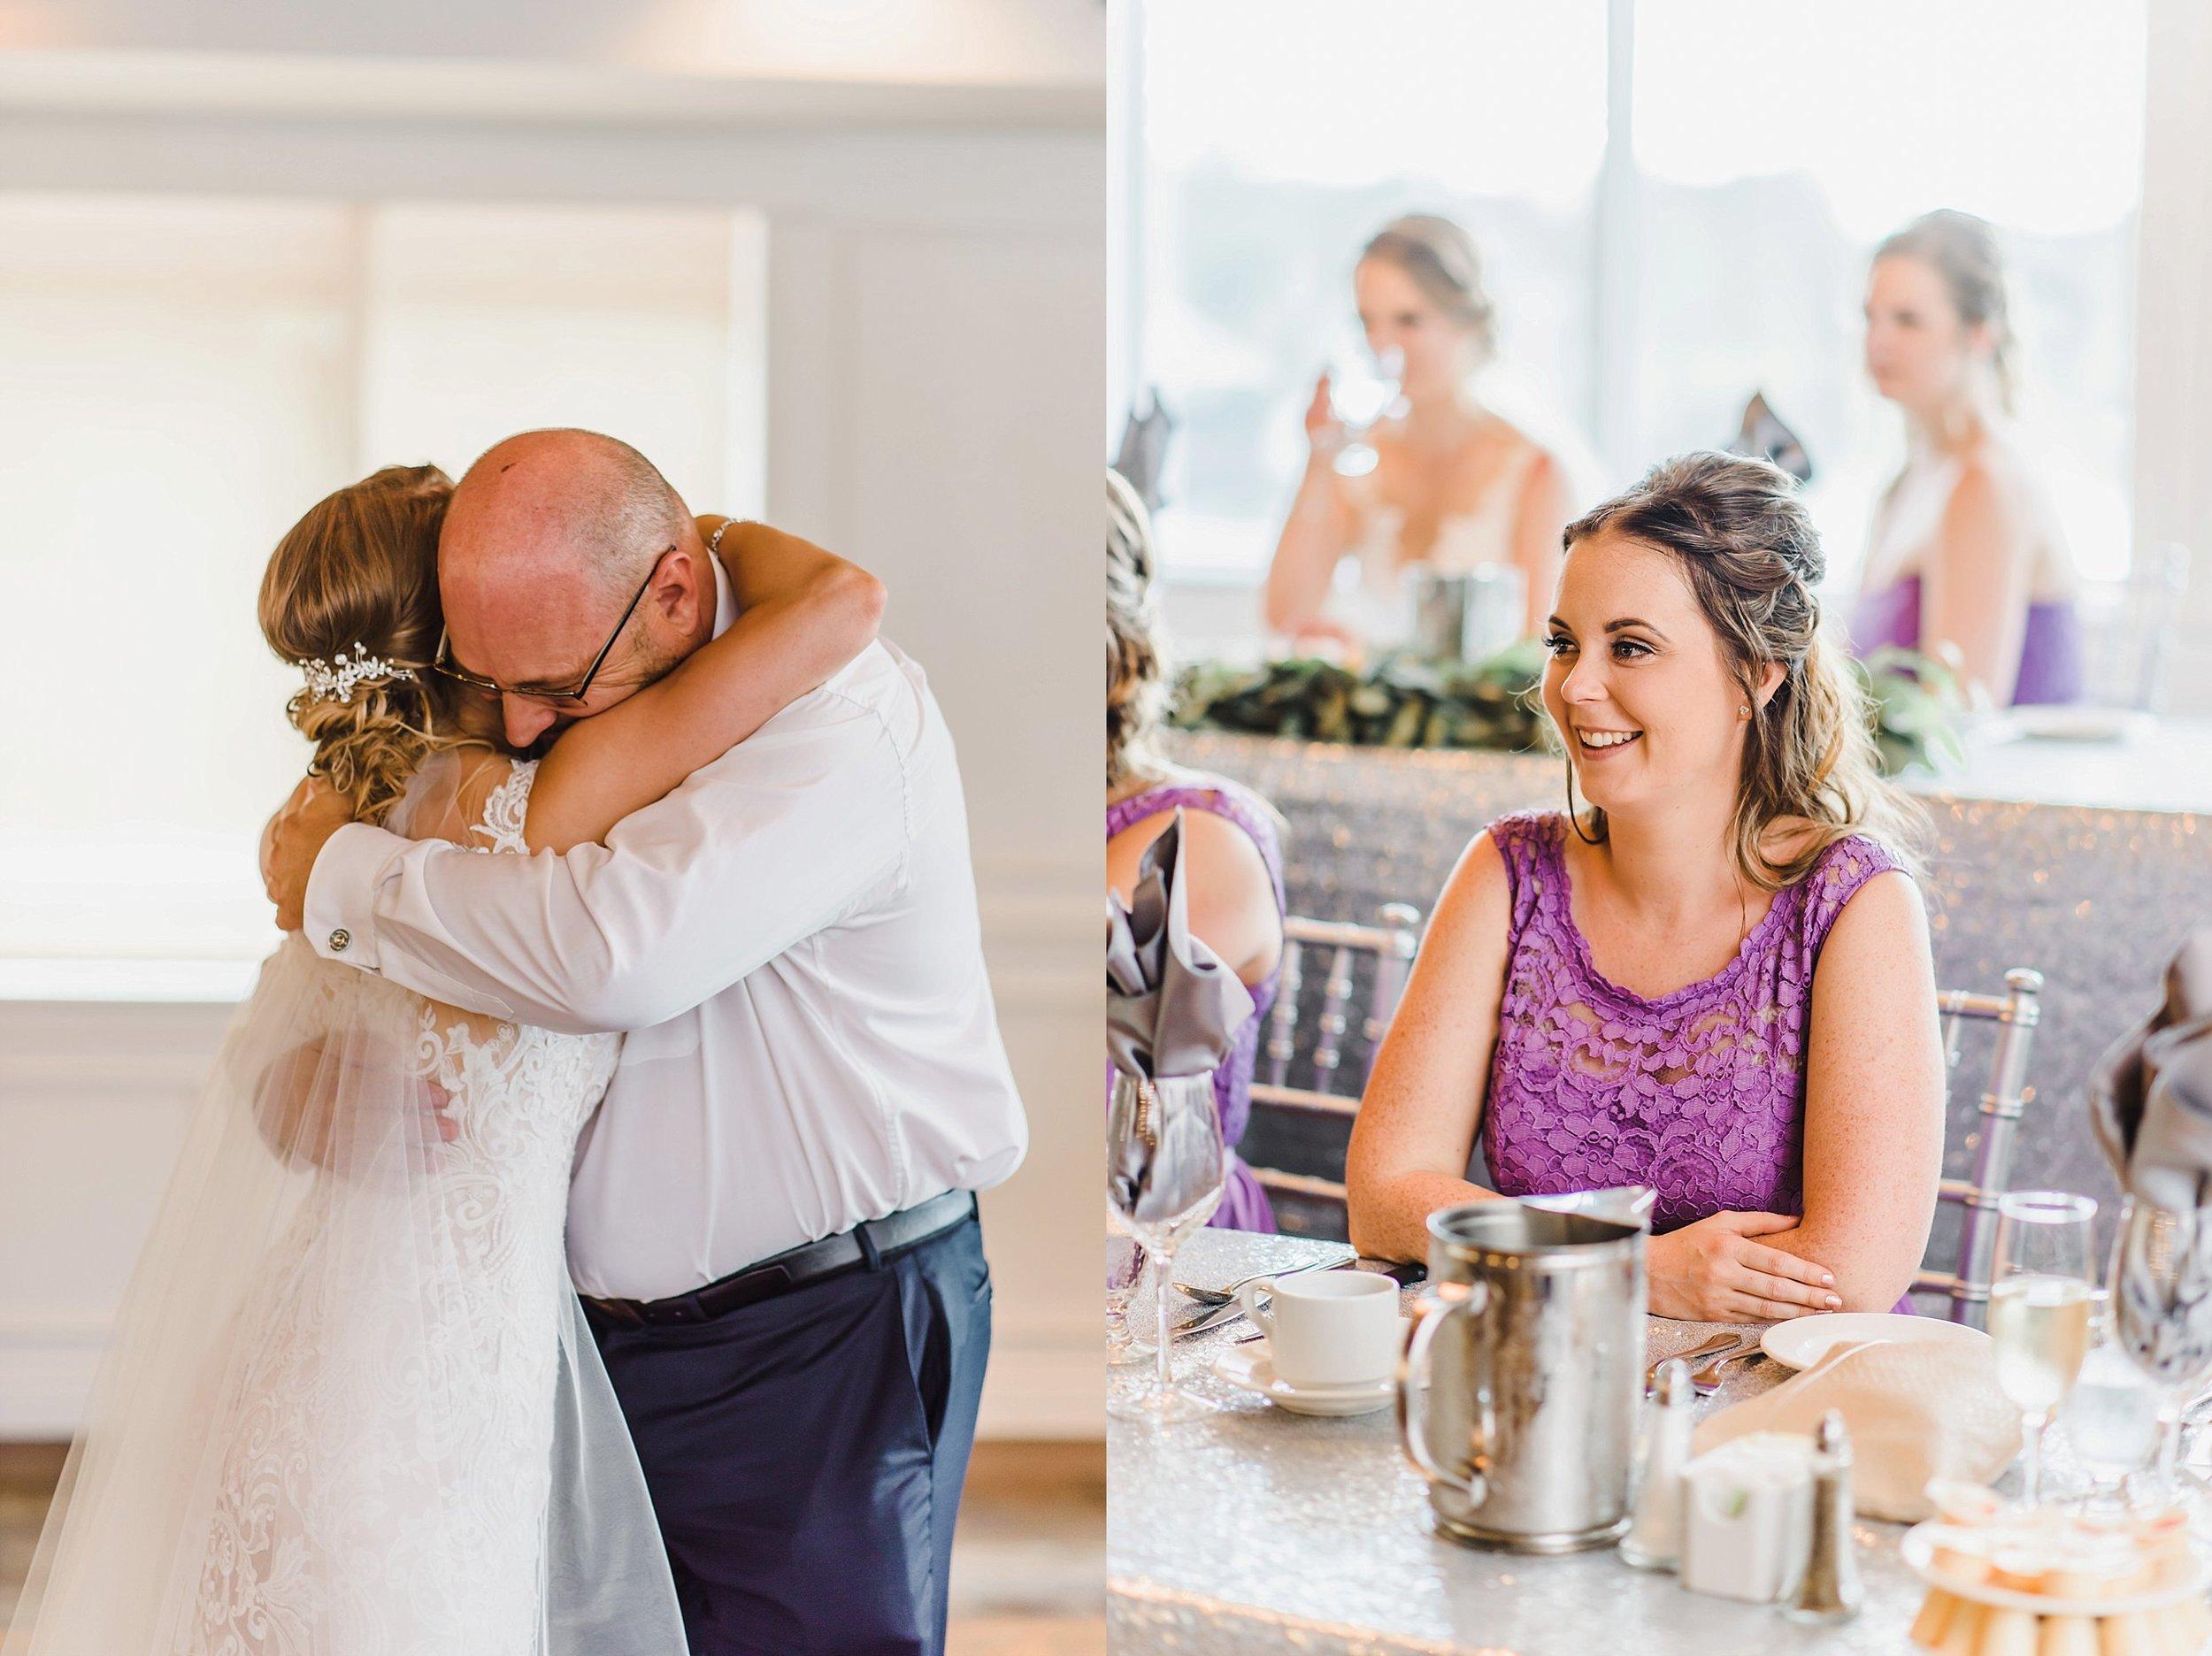 light airy indie fine art ottawa wedding photographer | Ali and Batoul Photography_1337.jpg